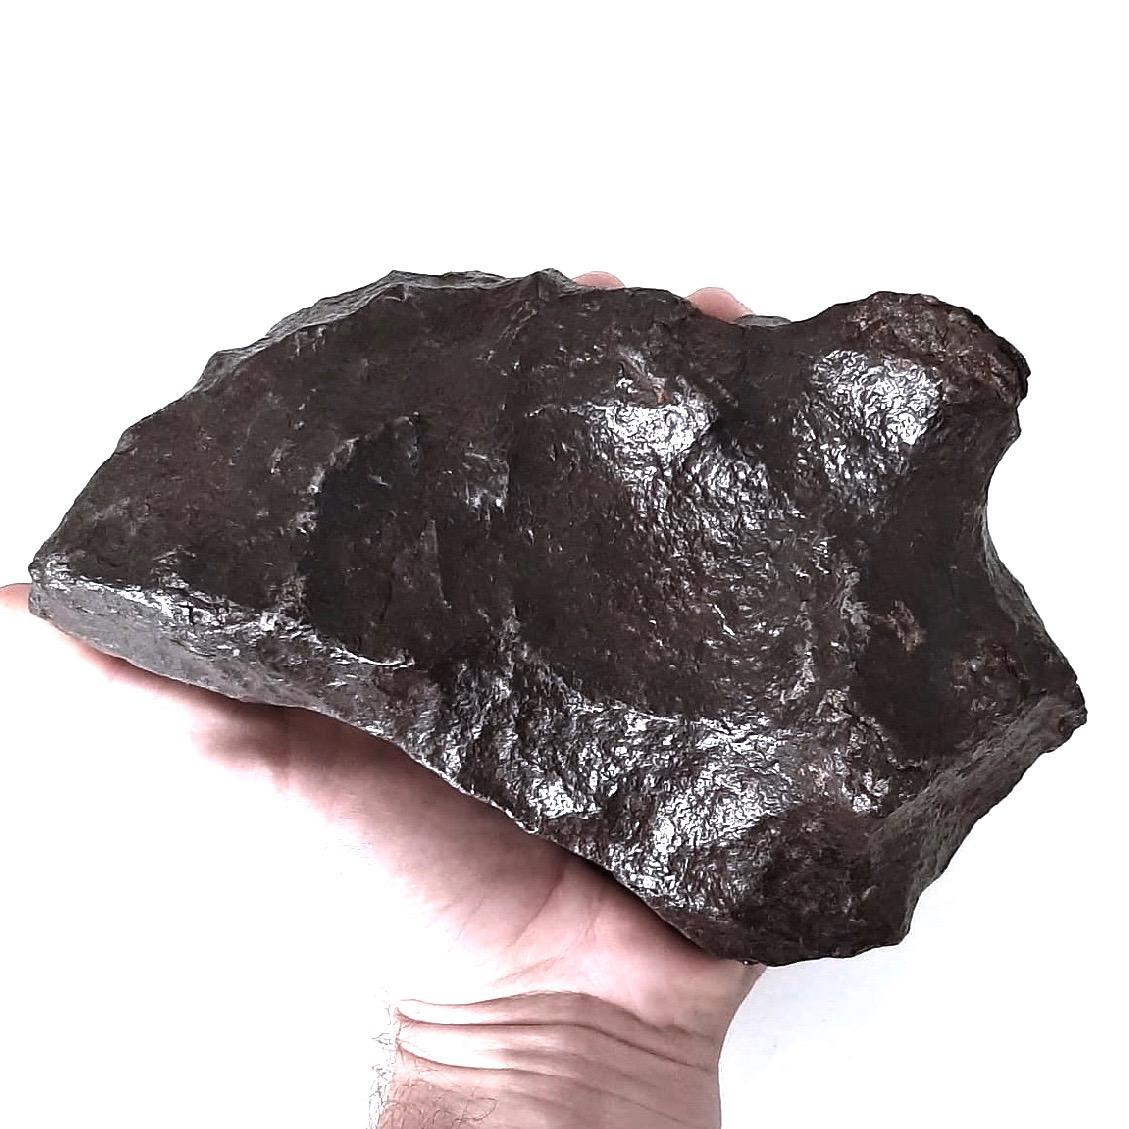 Canyon Diablo meteorite. Huge piece.